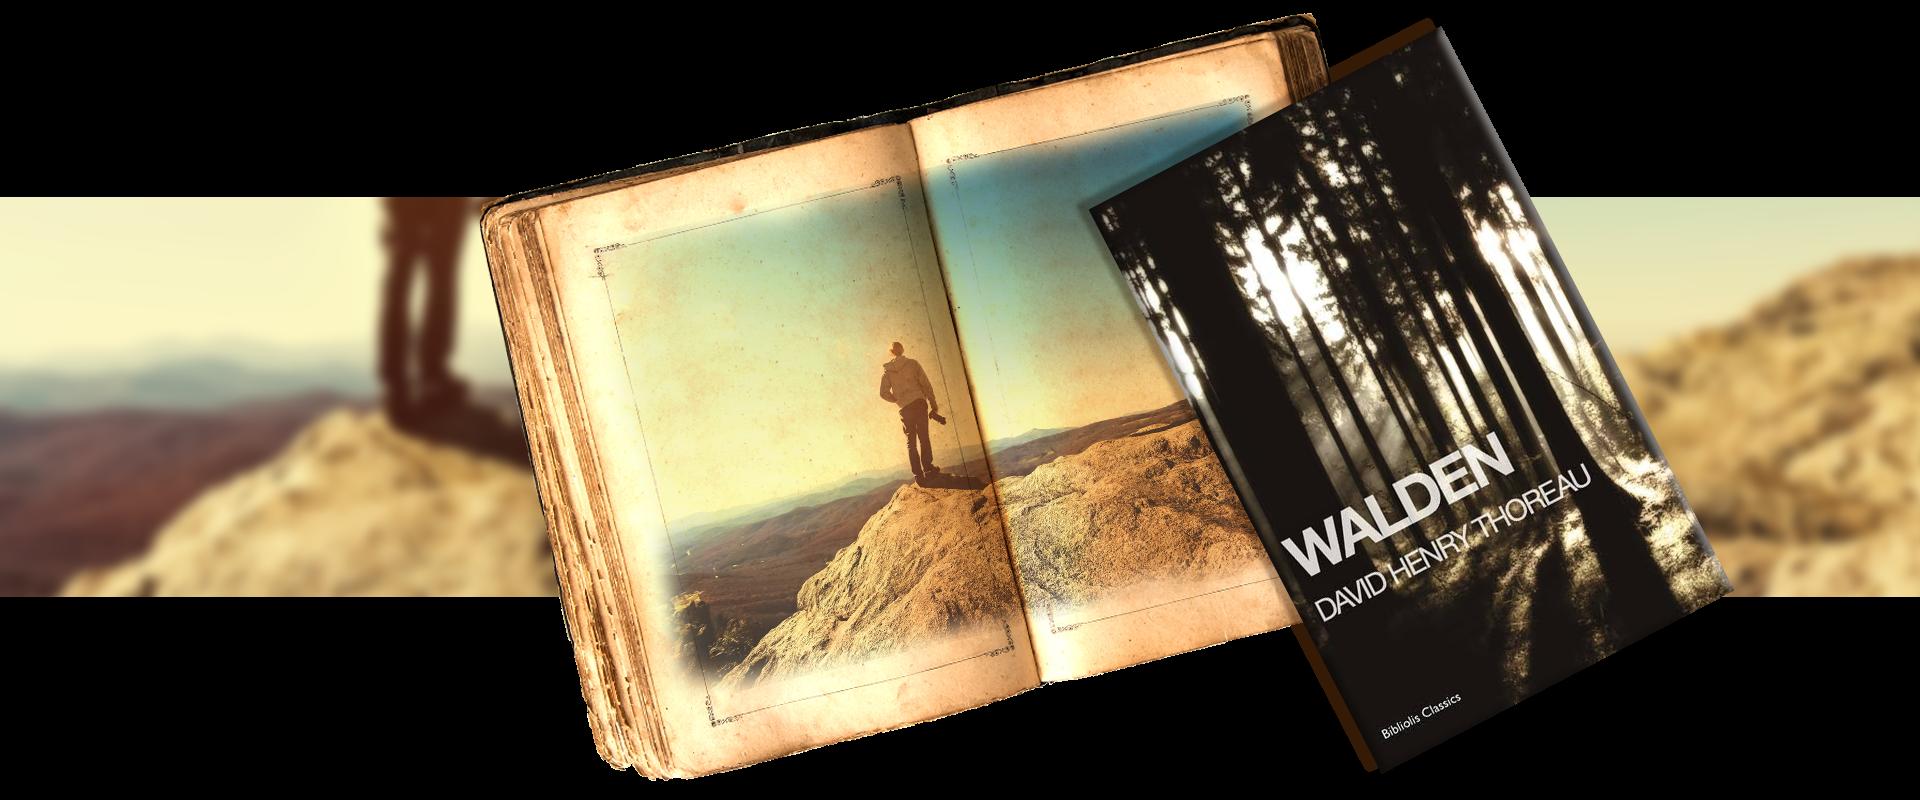 Walden by Davide Henry Thoreau - vintage book - simple life of a traveler